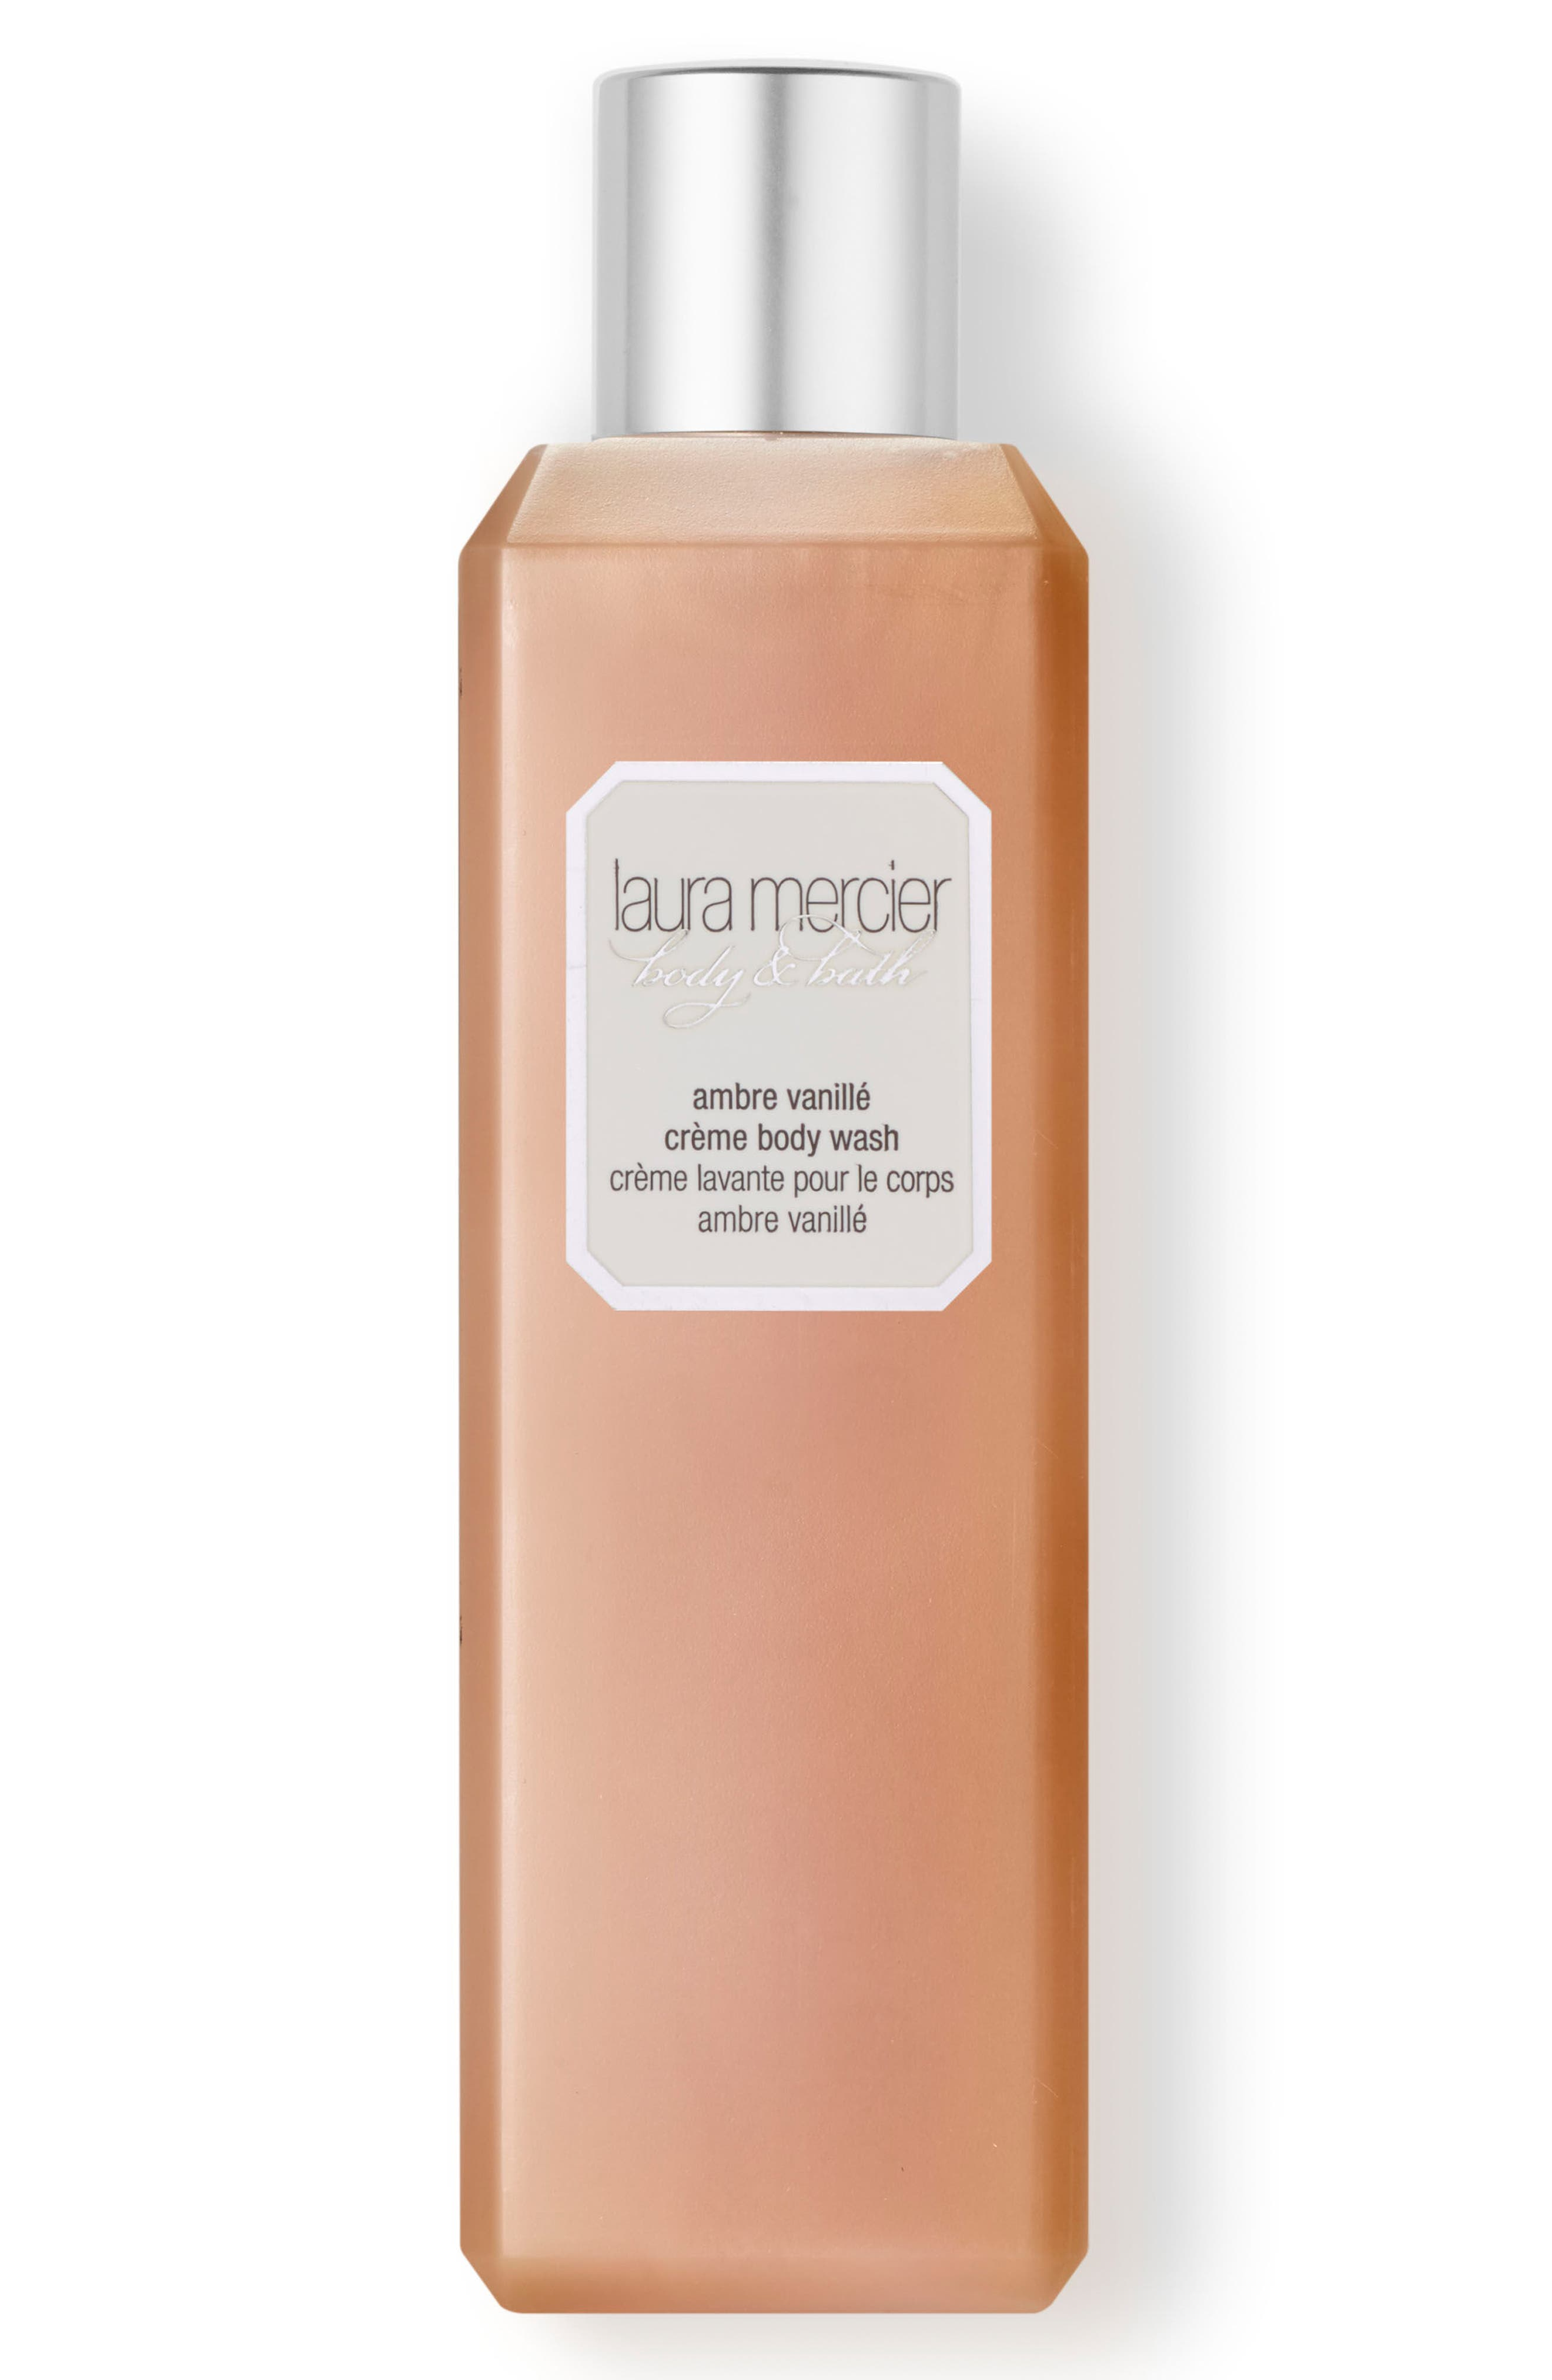 Alternate Image 1 Selected - Laura Mercier 'Ambre Vanillé' Crème Body Wash